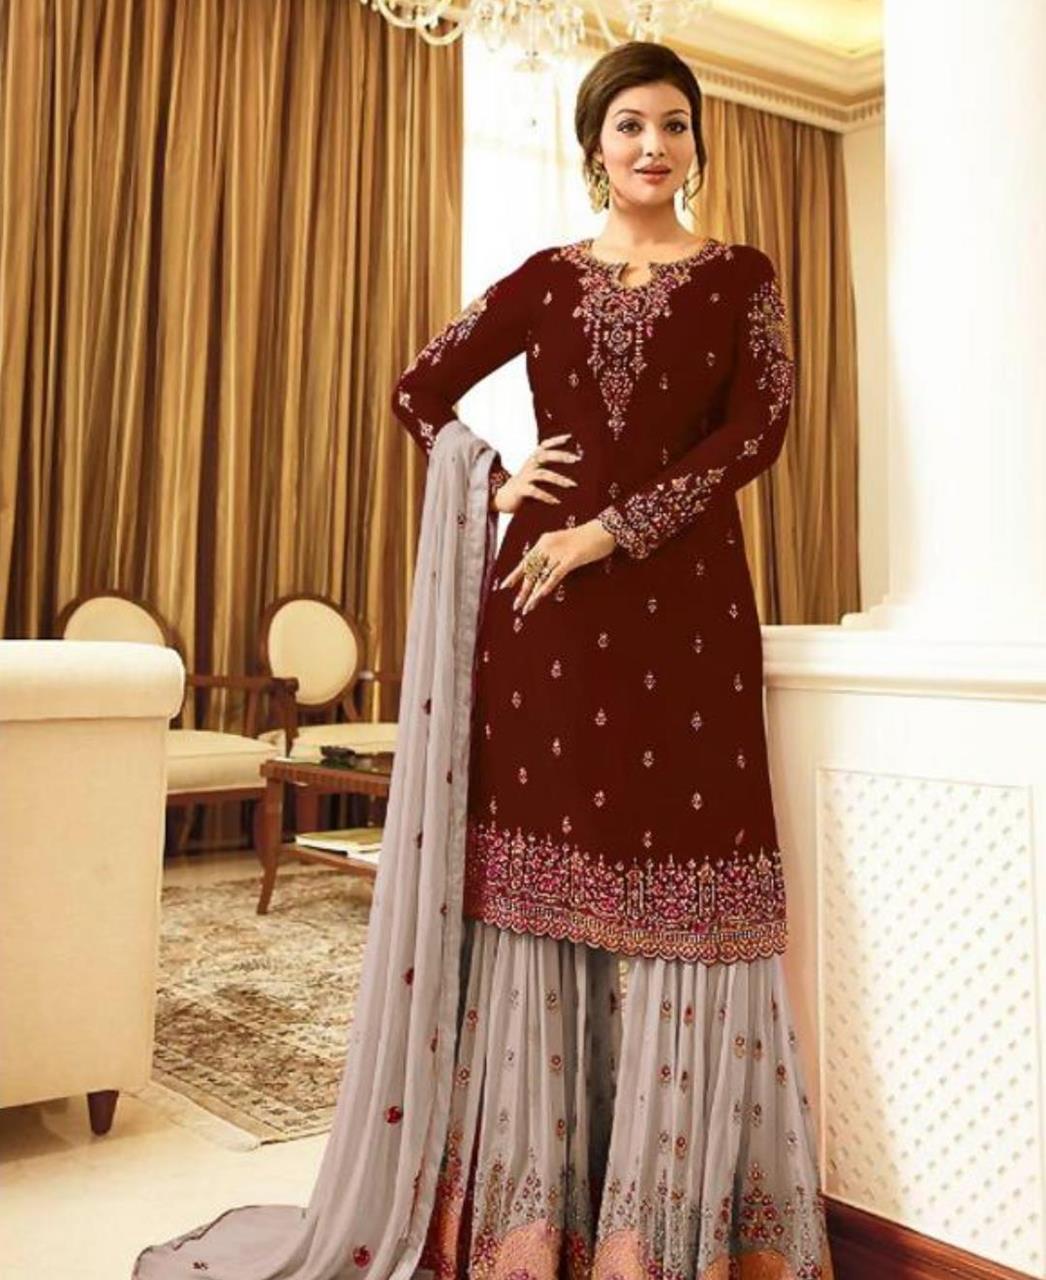 Embroidered Georgette Straight cut Salwar Kameez in Maroon